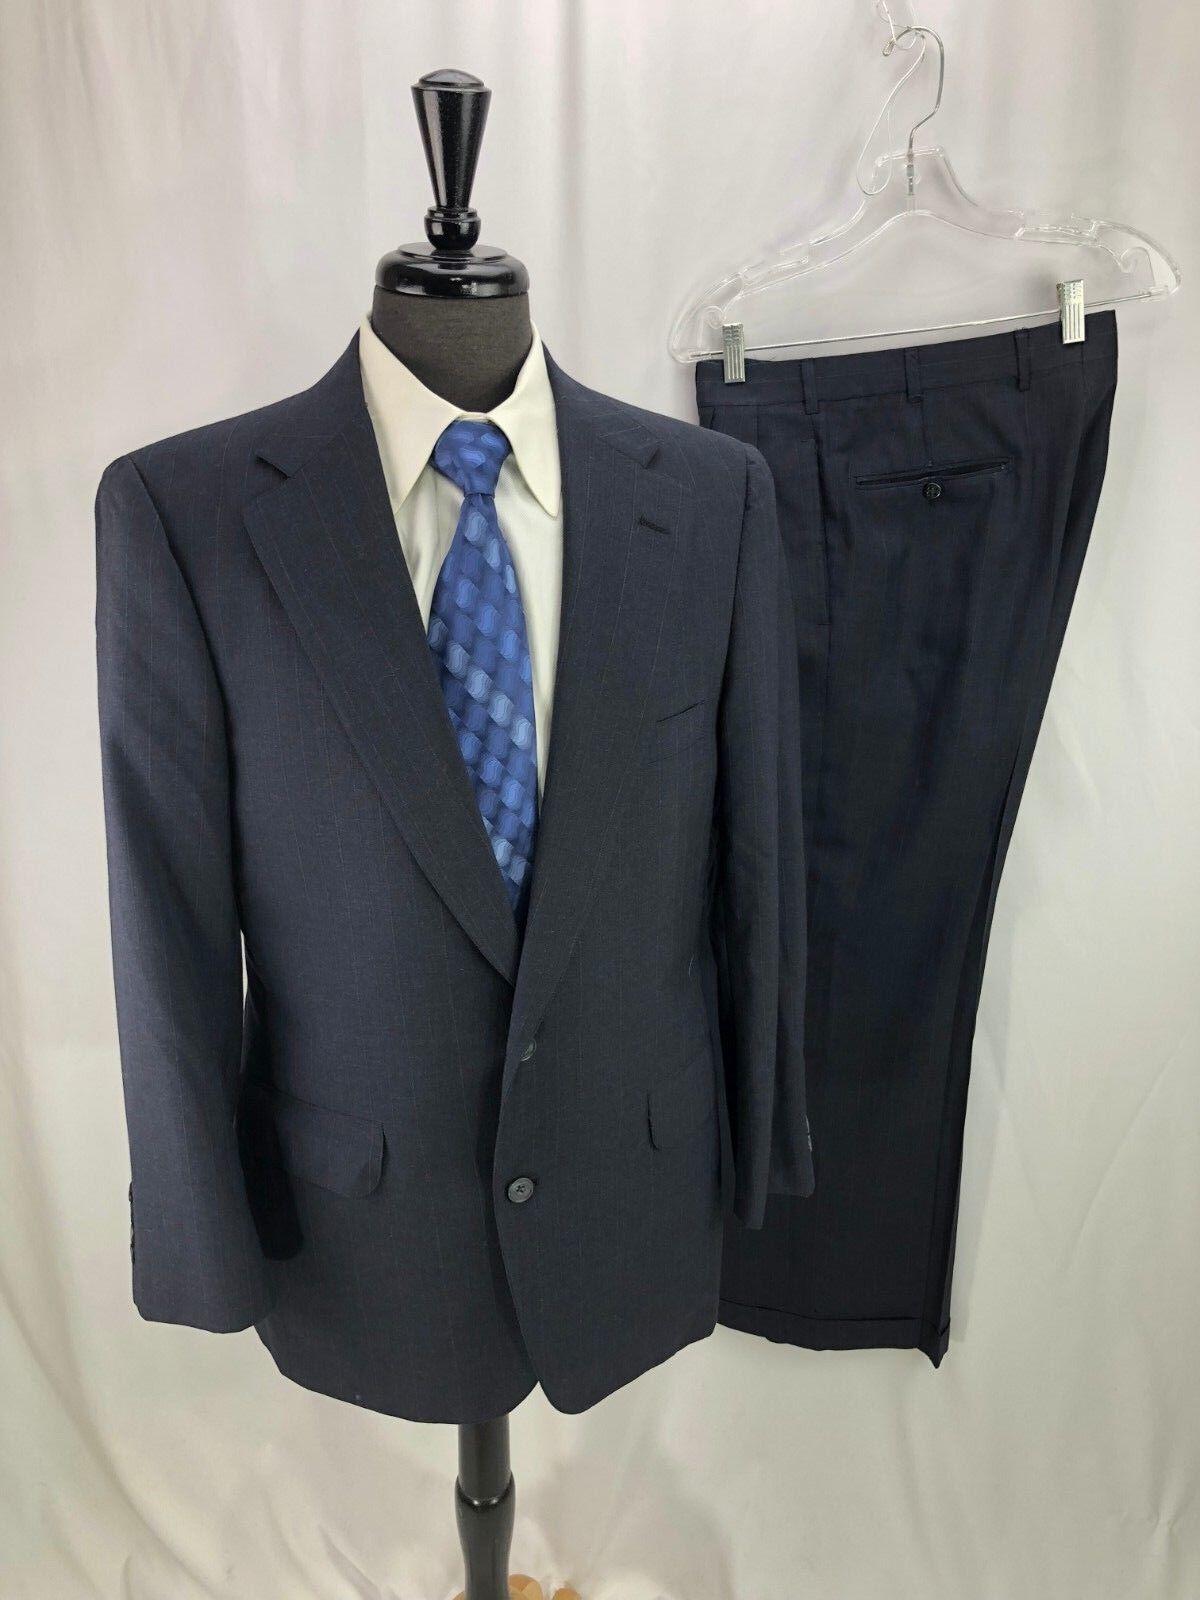 Norman Hilton Mens bluee Pinstripe Wool Suit 40R 32 x 29